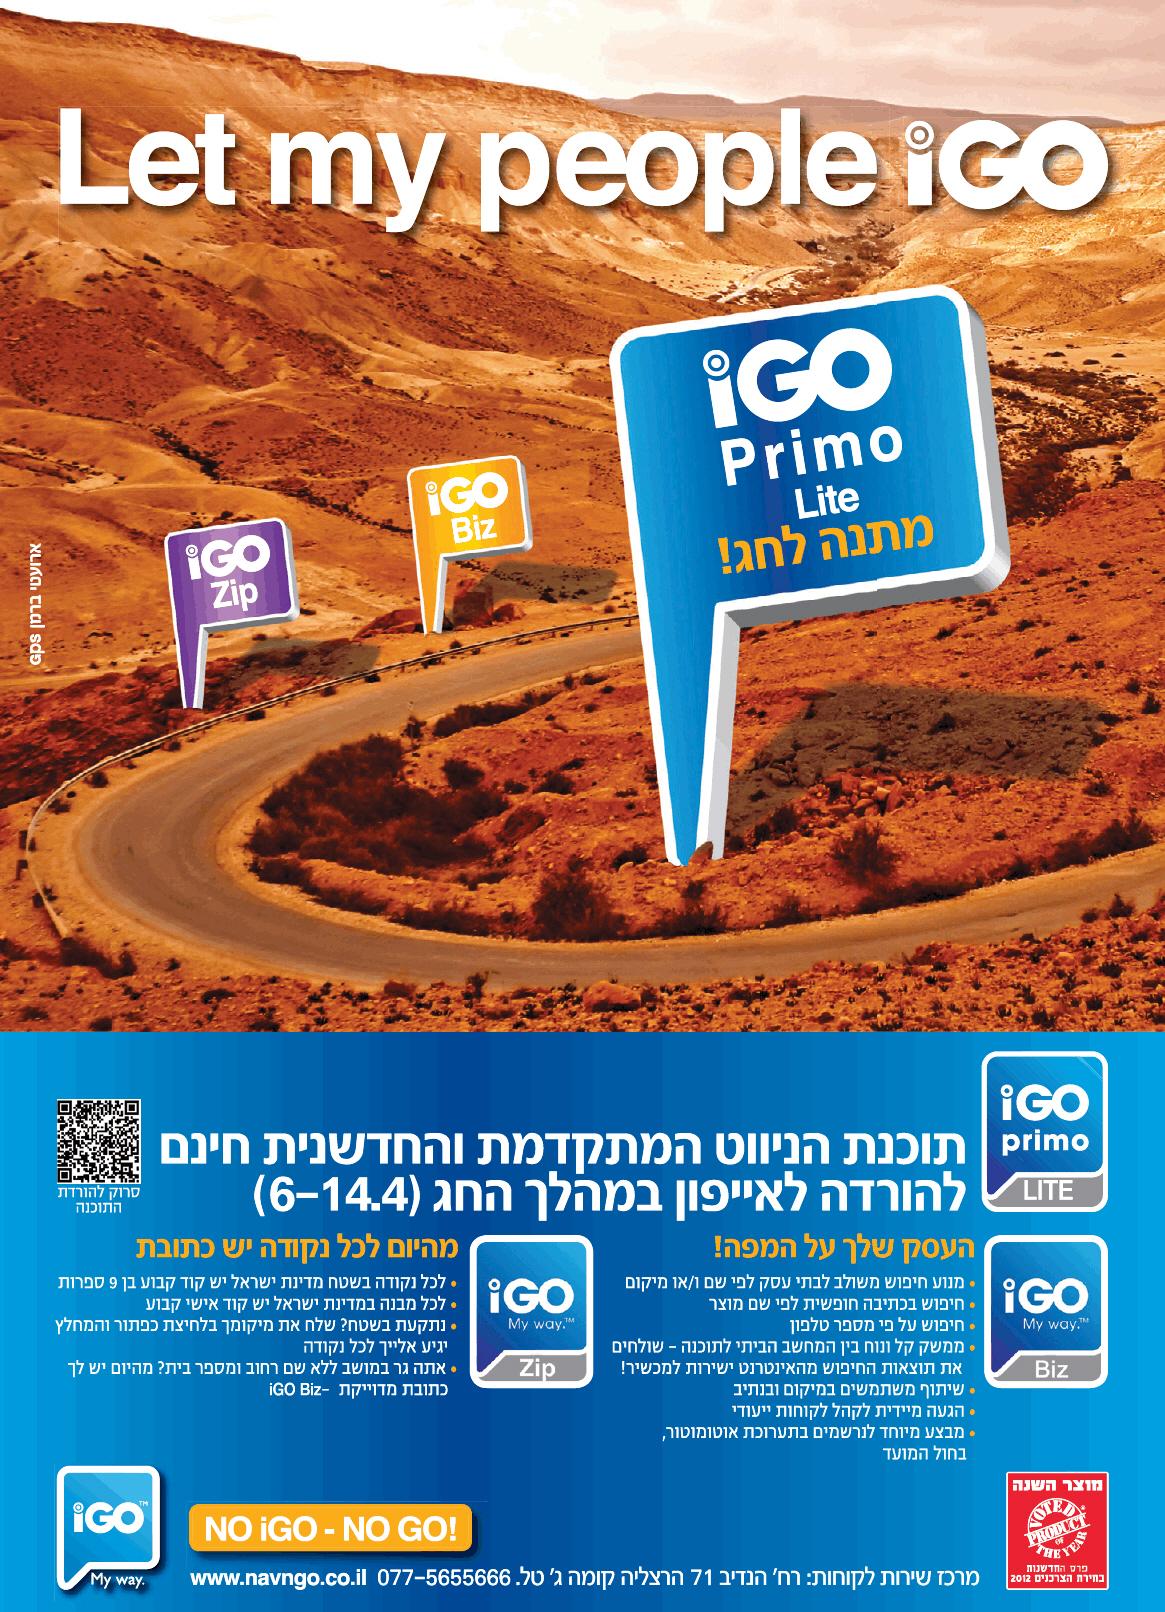 iGO Primo Light בחינם